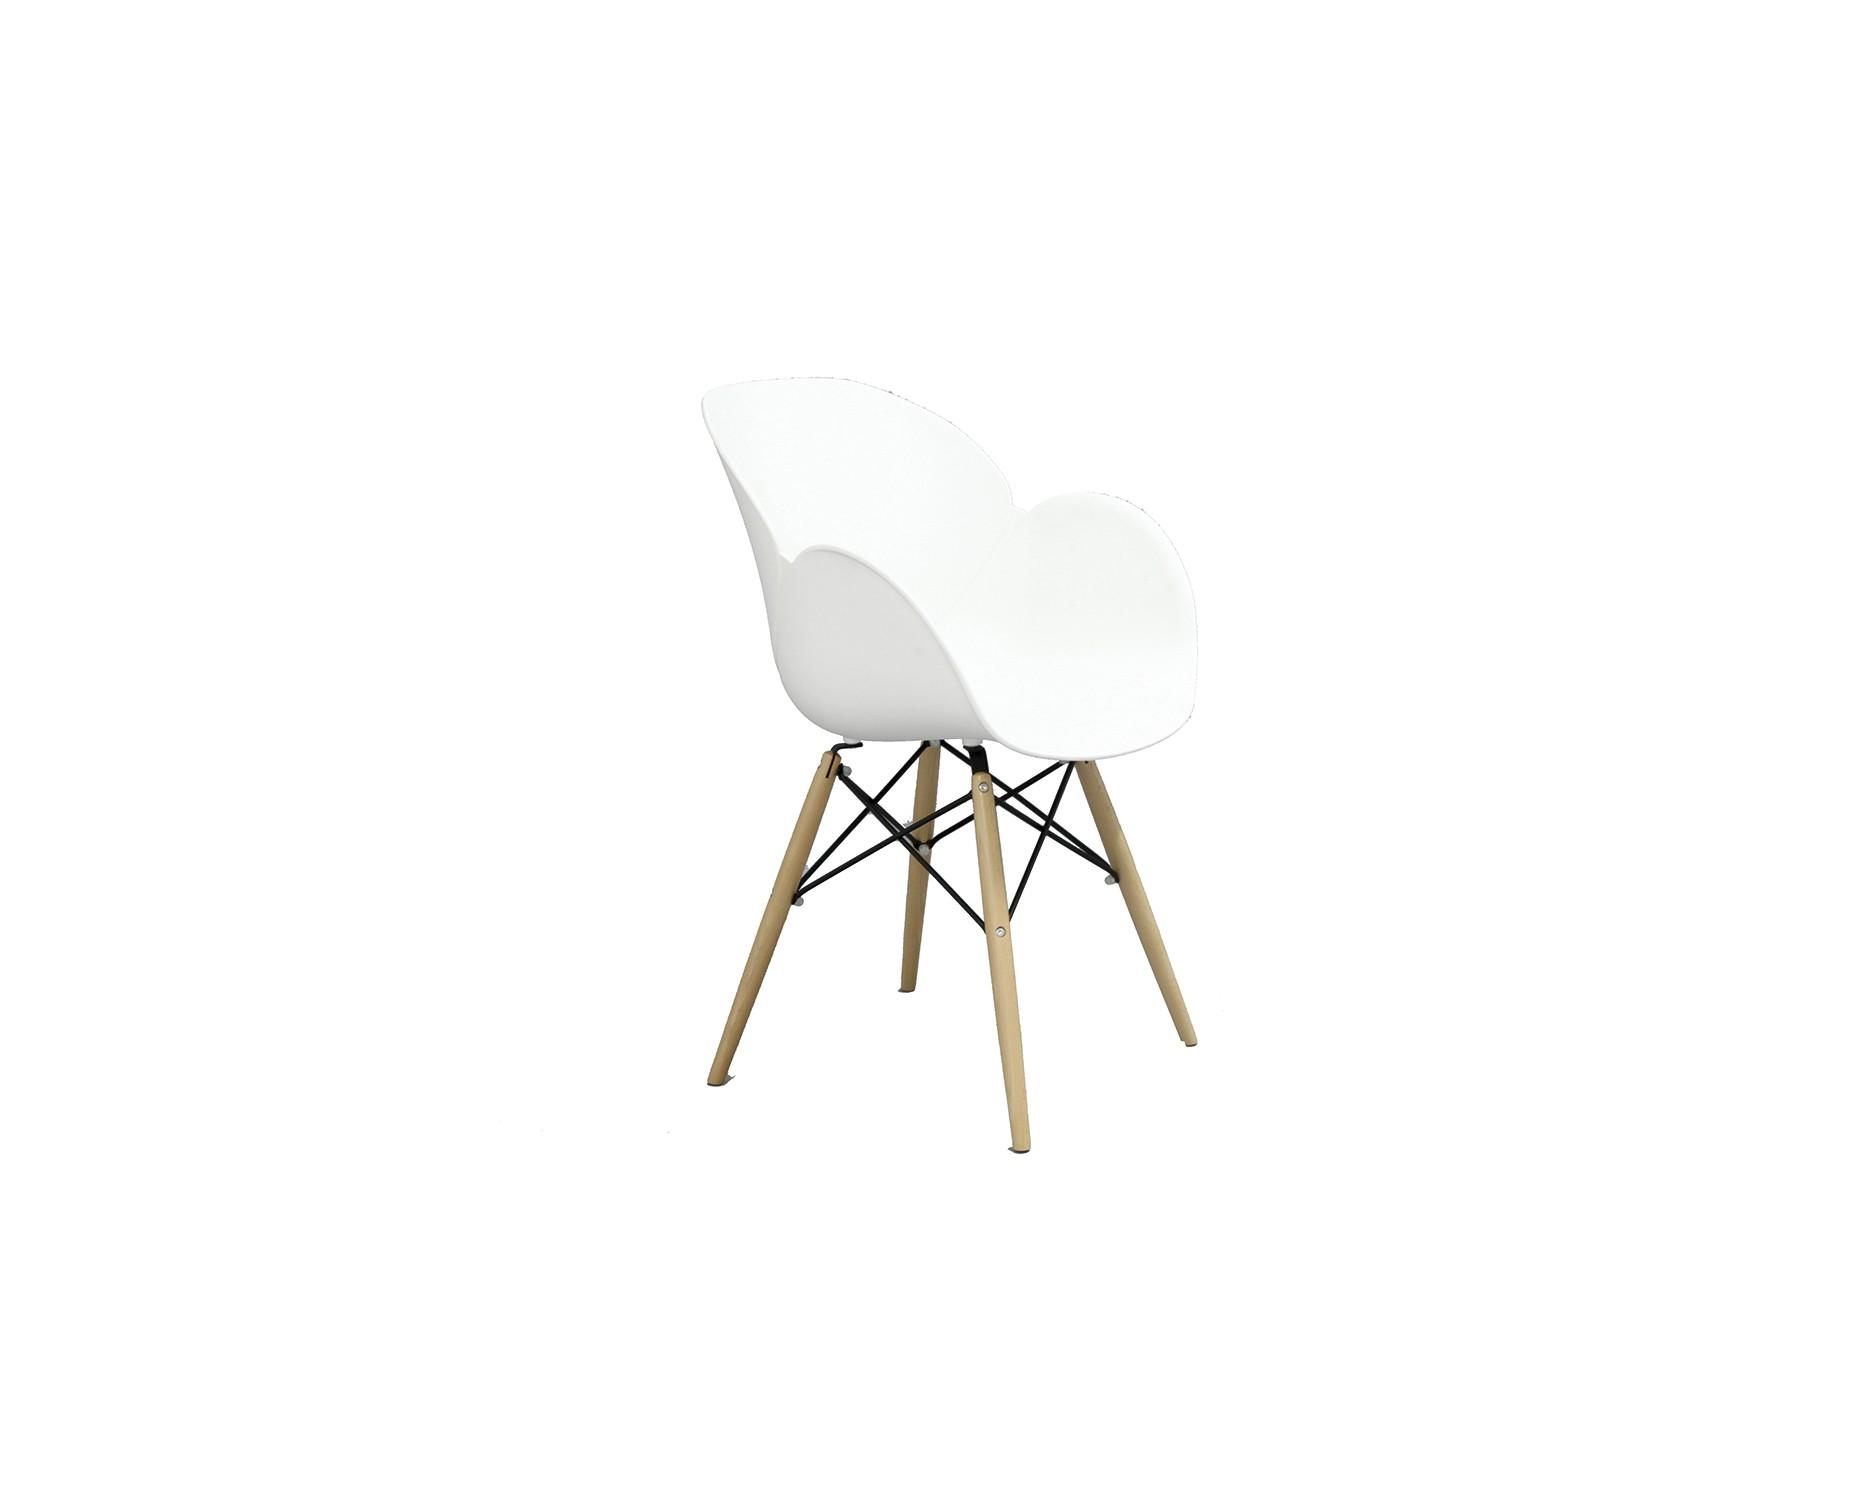 Europe Style Стул FL-08 белый europe style стол dt 903 белый